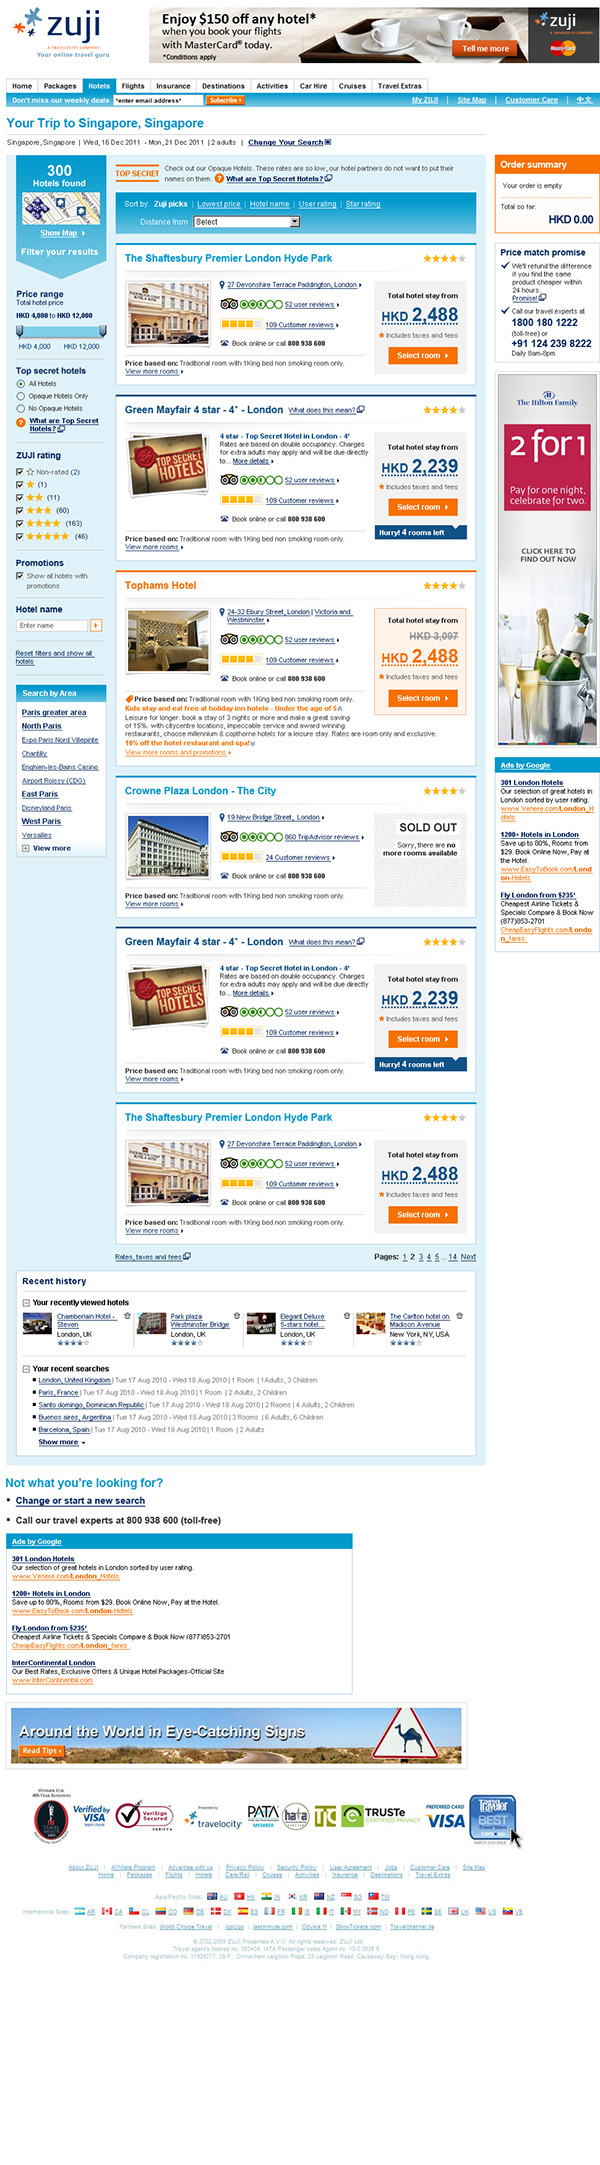 search results  Hotels  design  UI Design